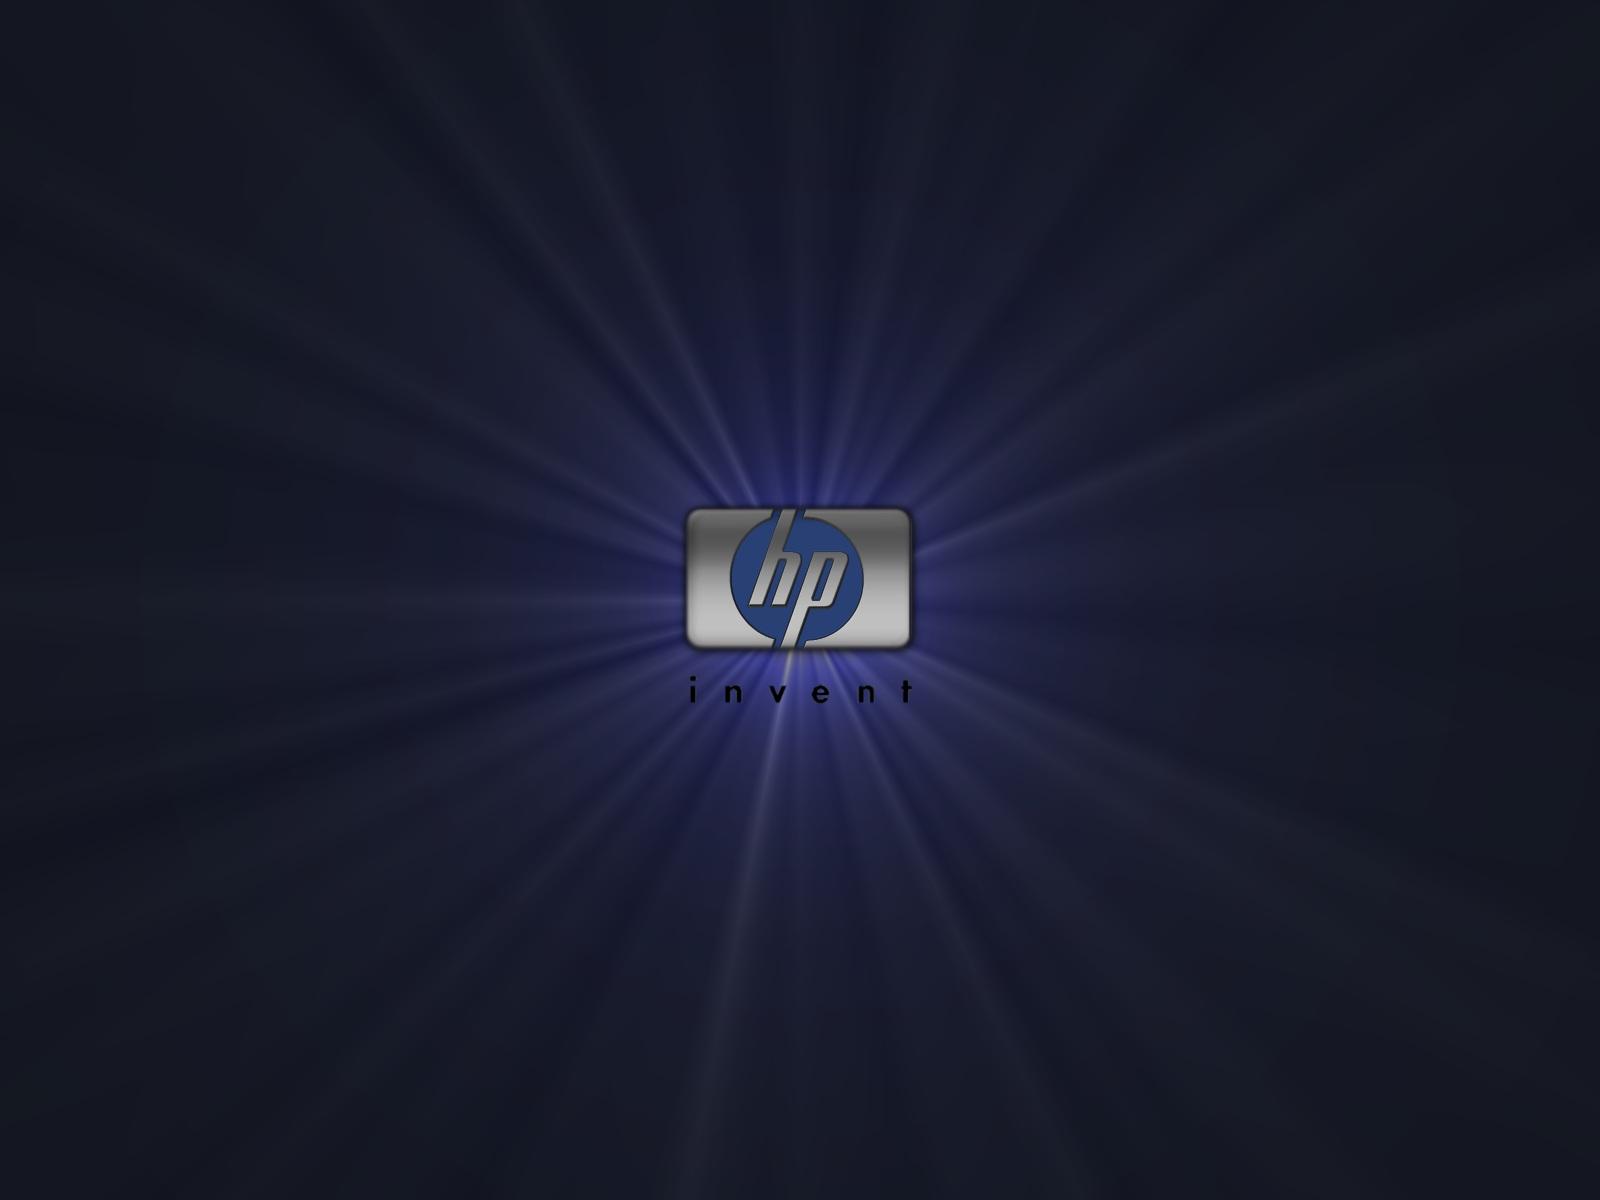 cool hp logo wallpaper - photo #35